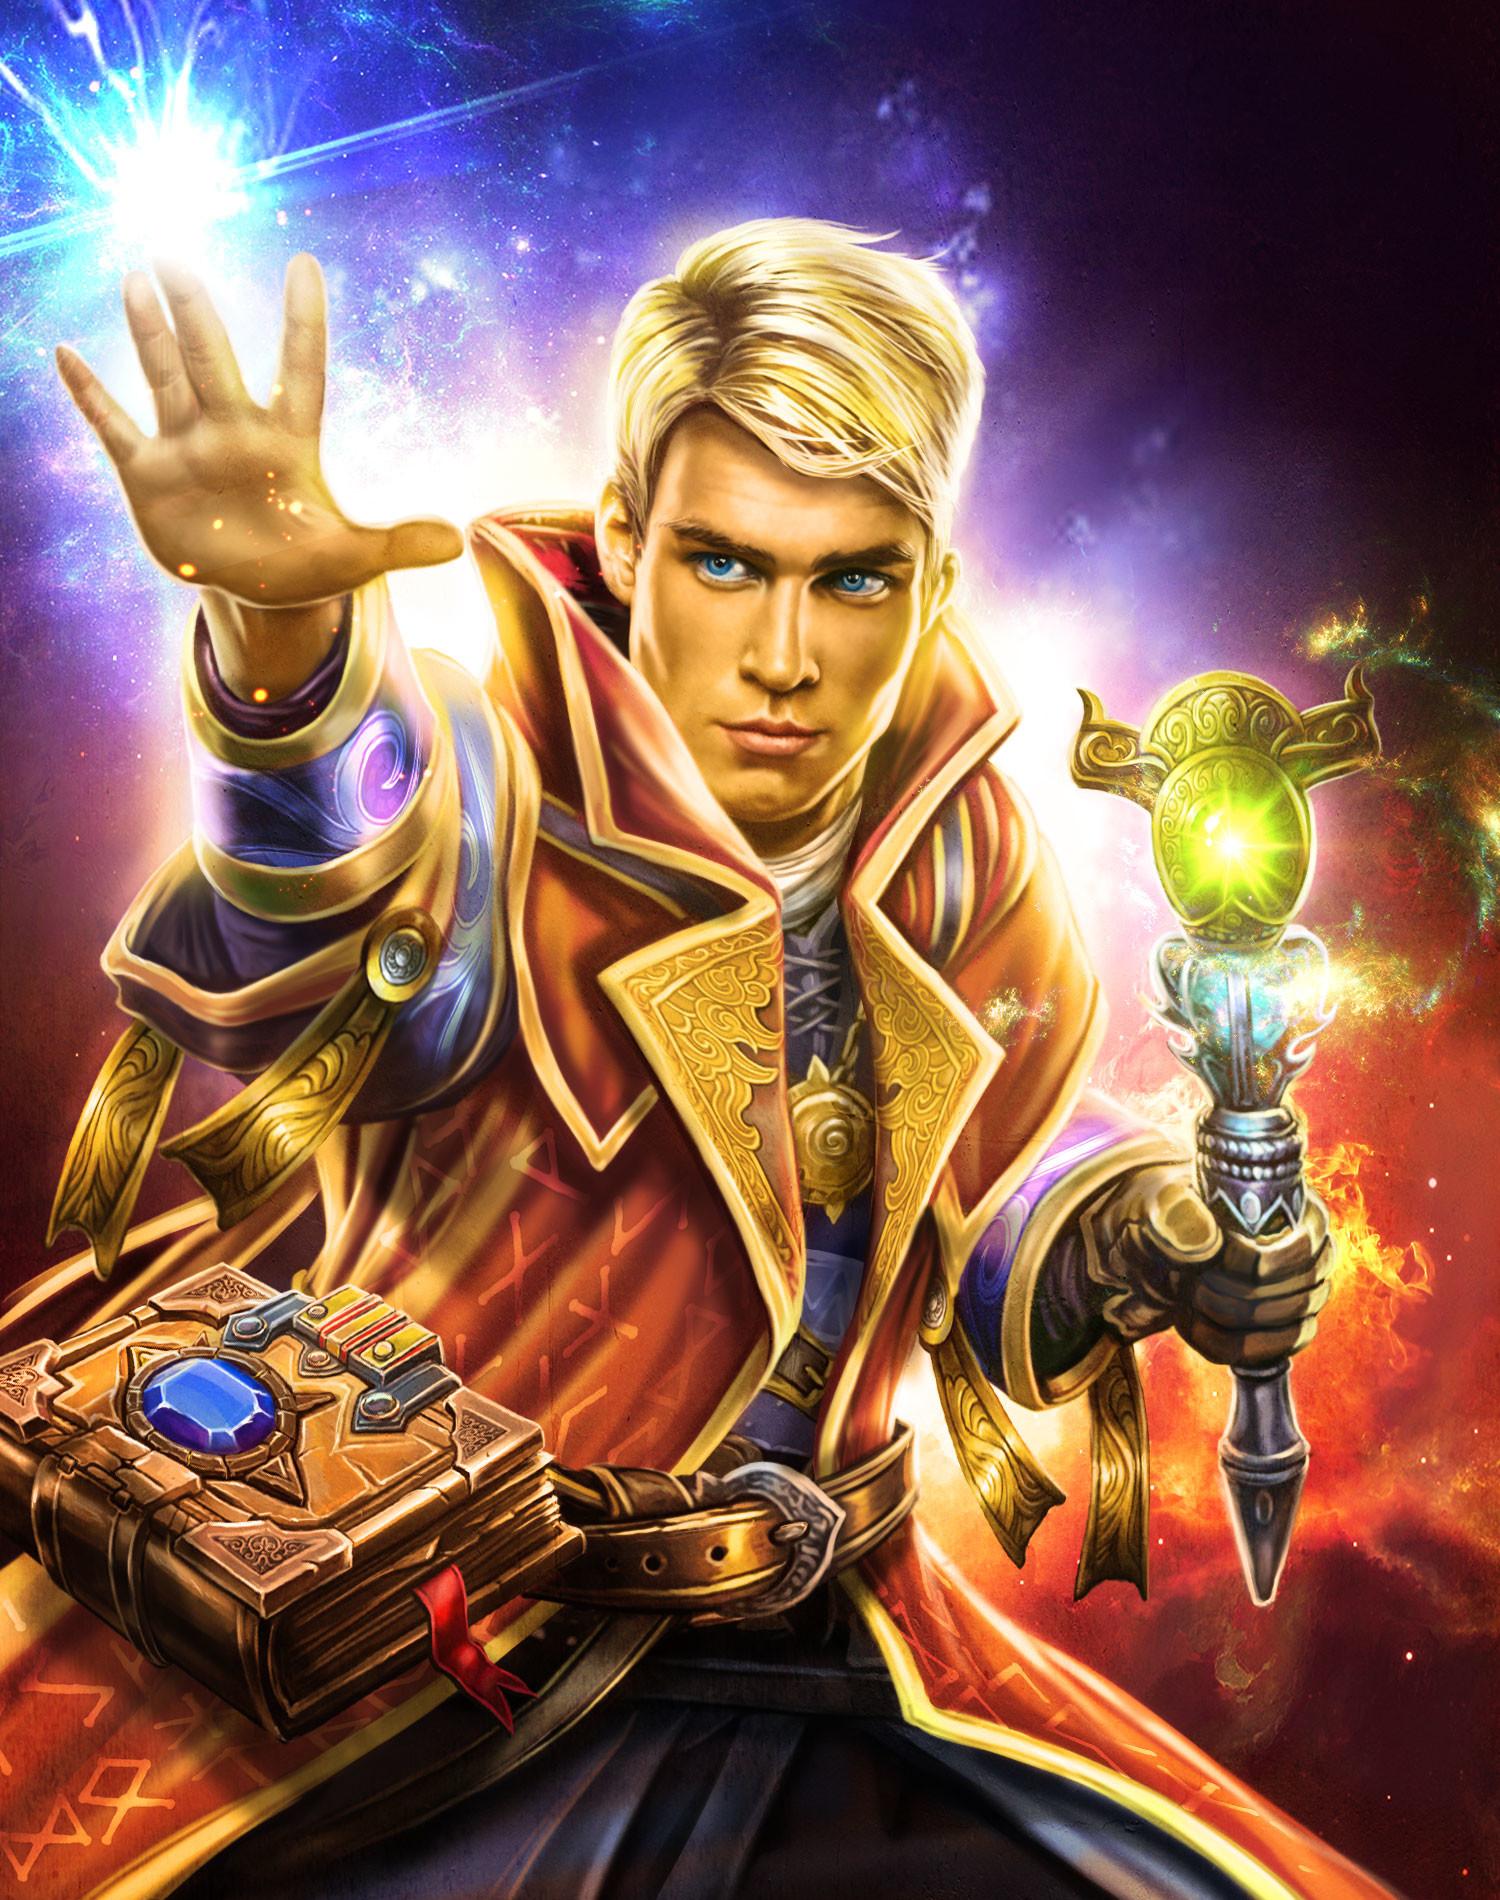 Artstation Wizard Apprentice Atanas Stoykov